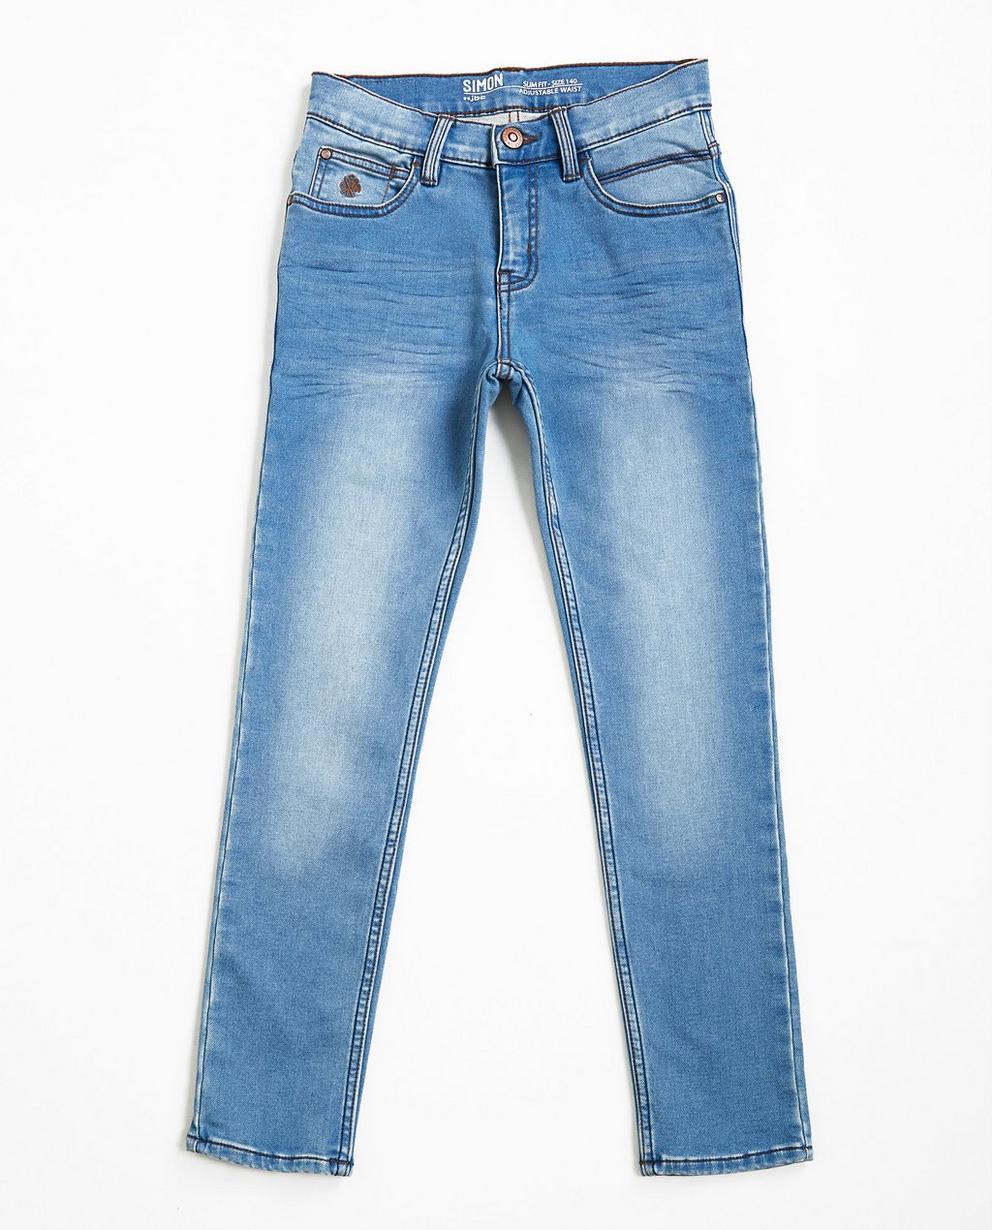 Lichtblauwe slim jeans - sweat denim - JBC